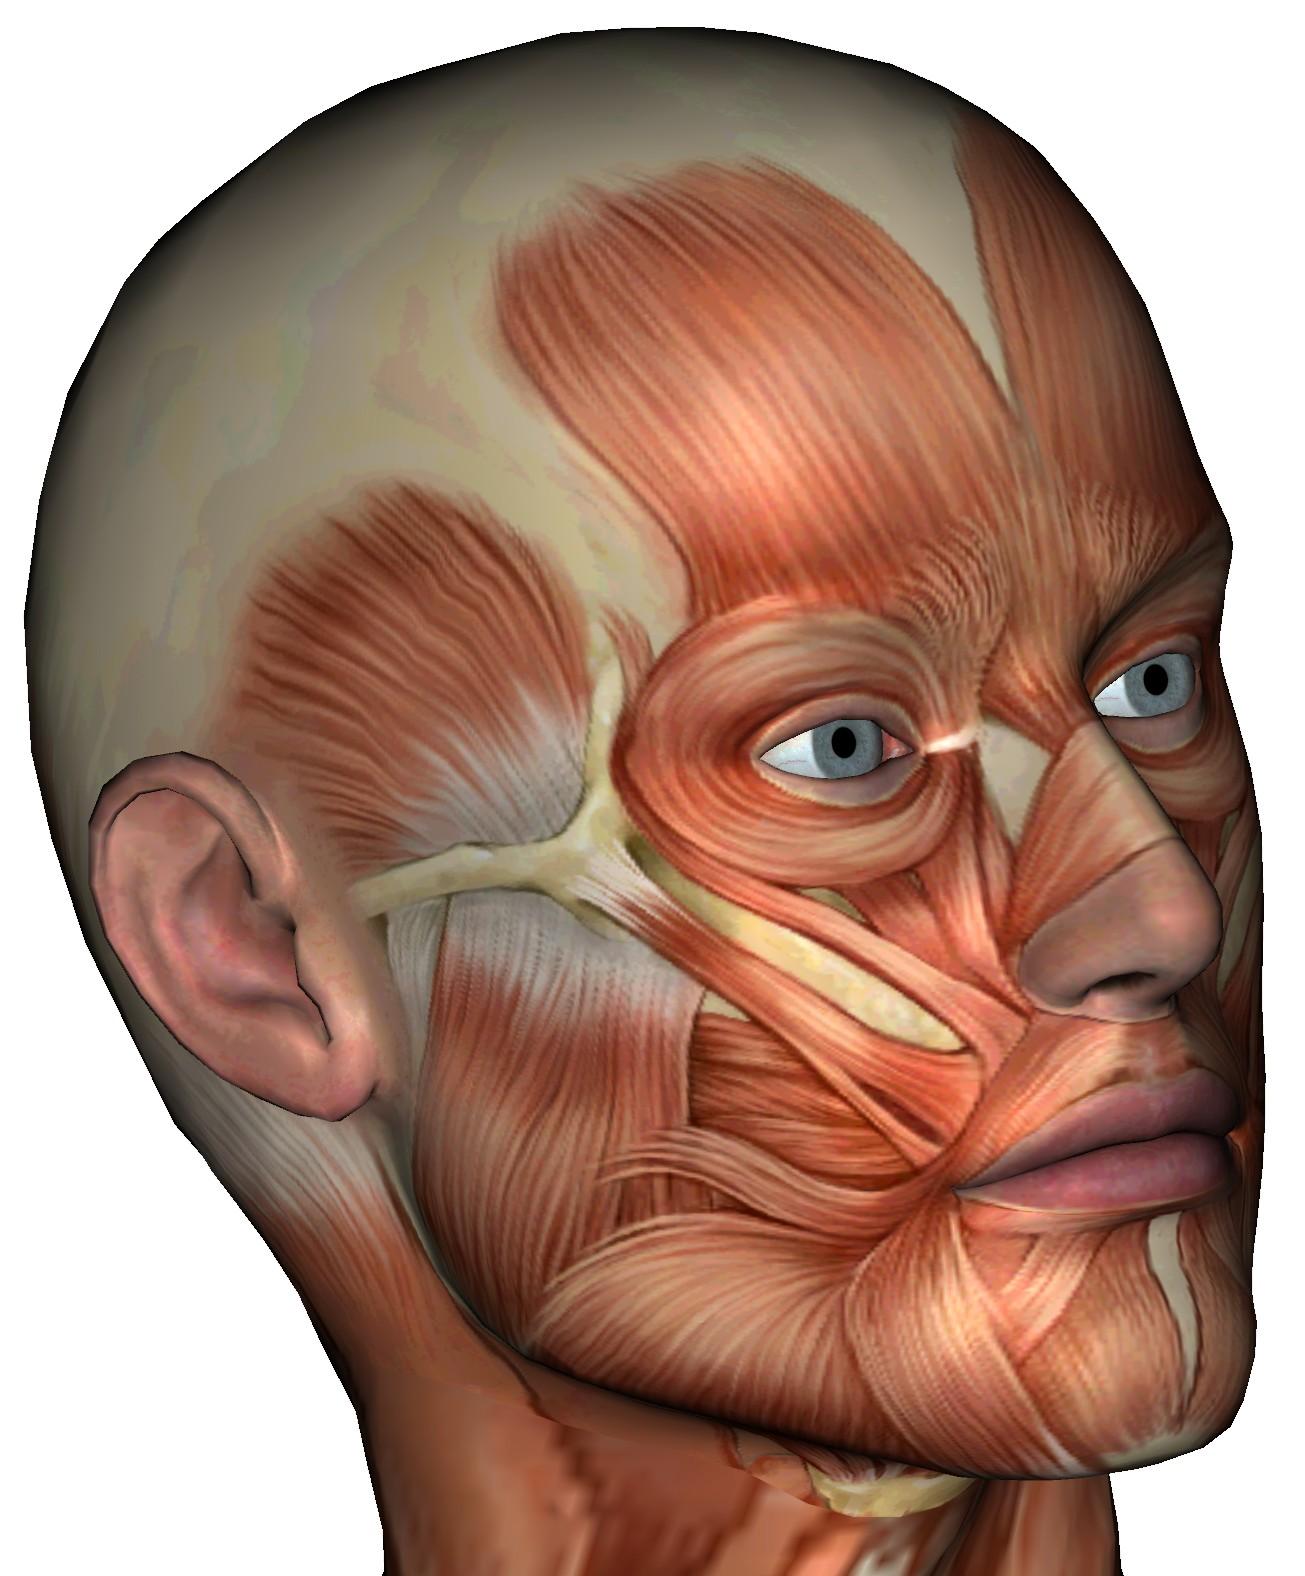 Body Parts Muscles Massage Massage Videos Massage Pictures